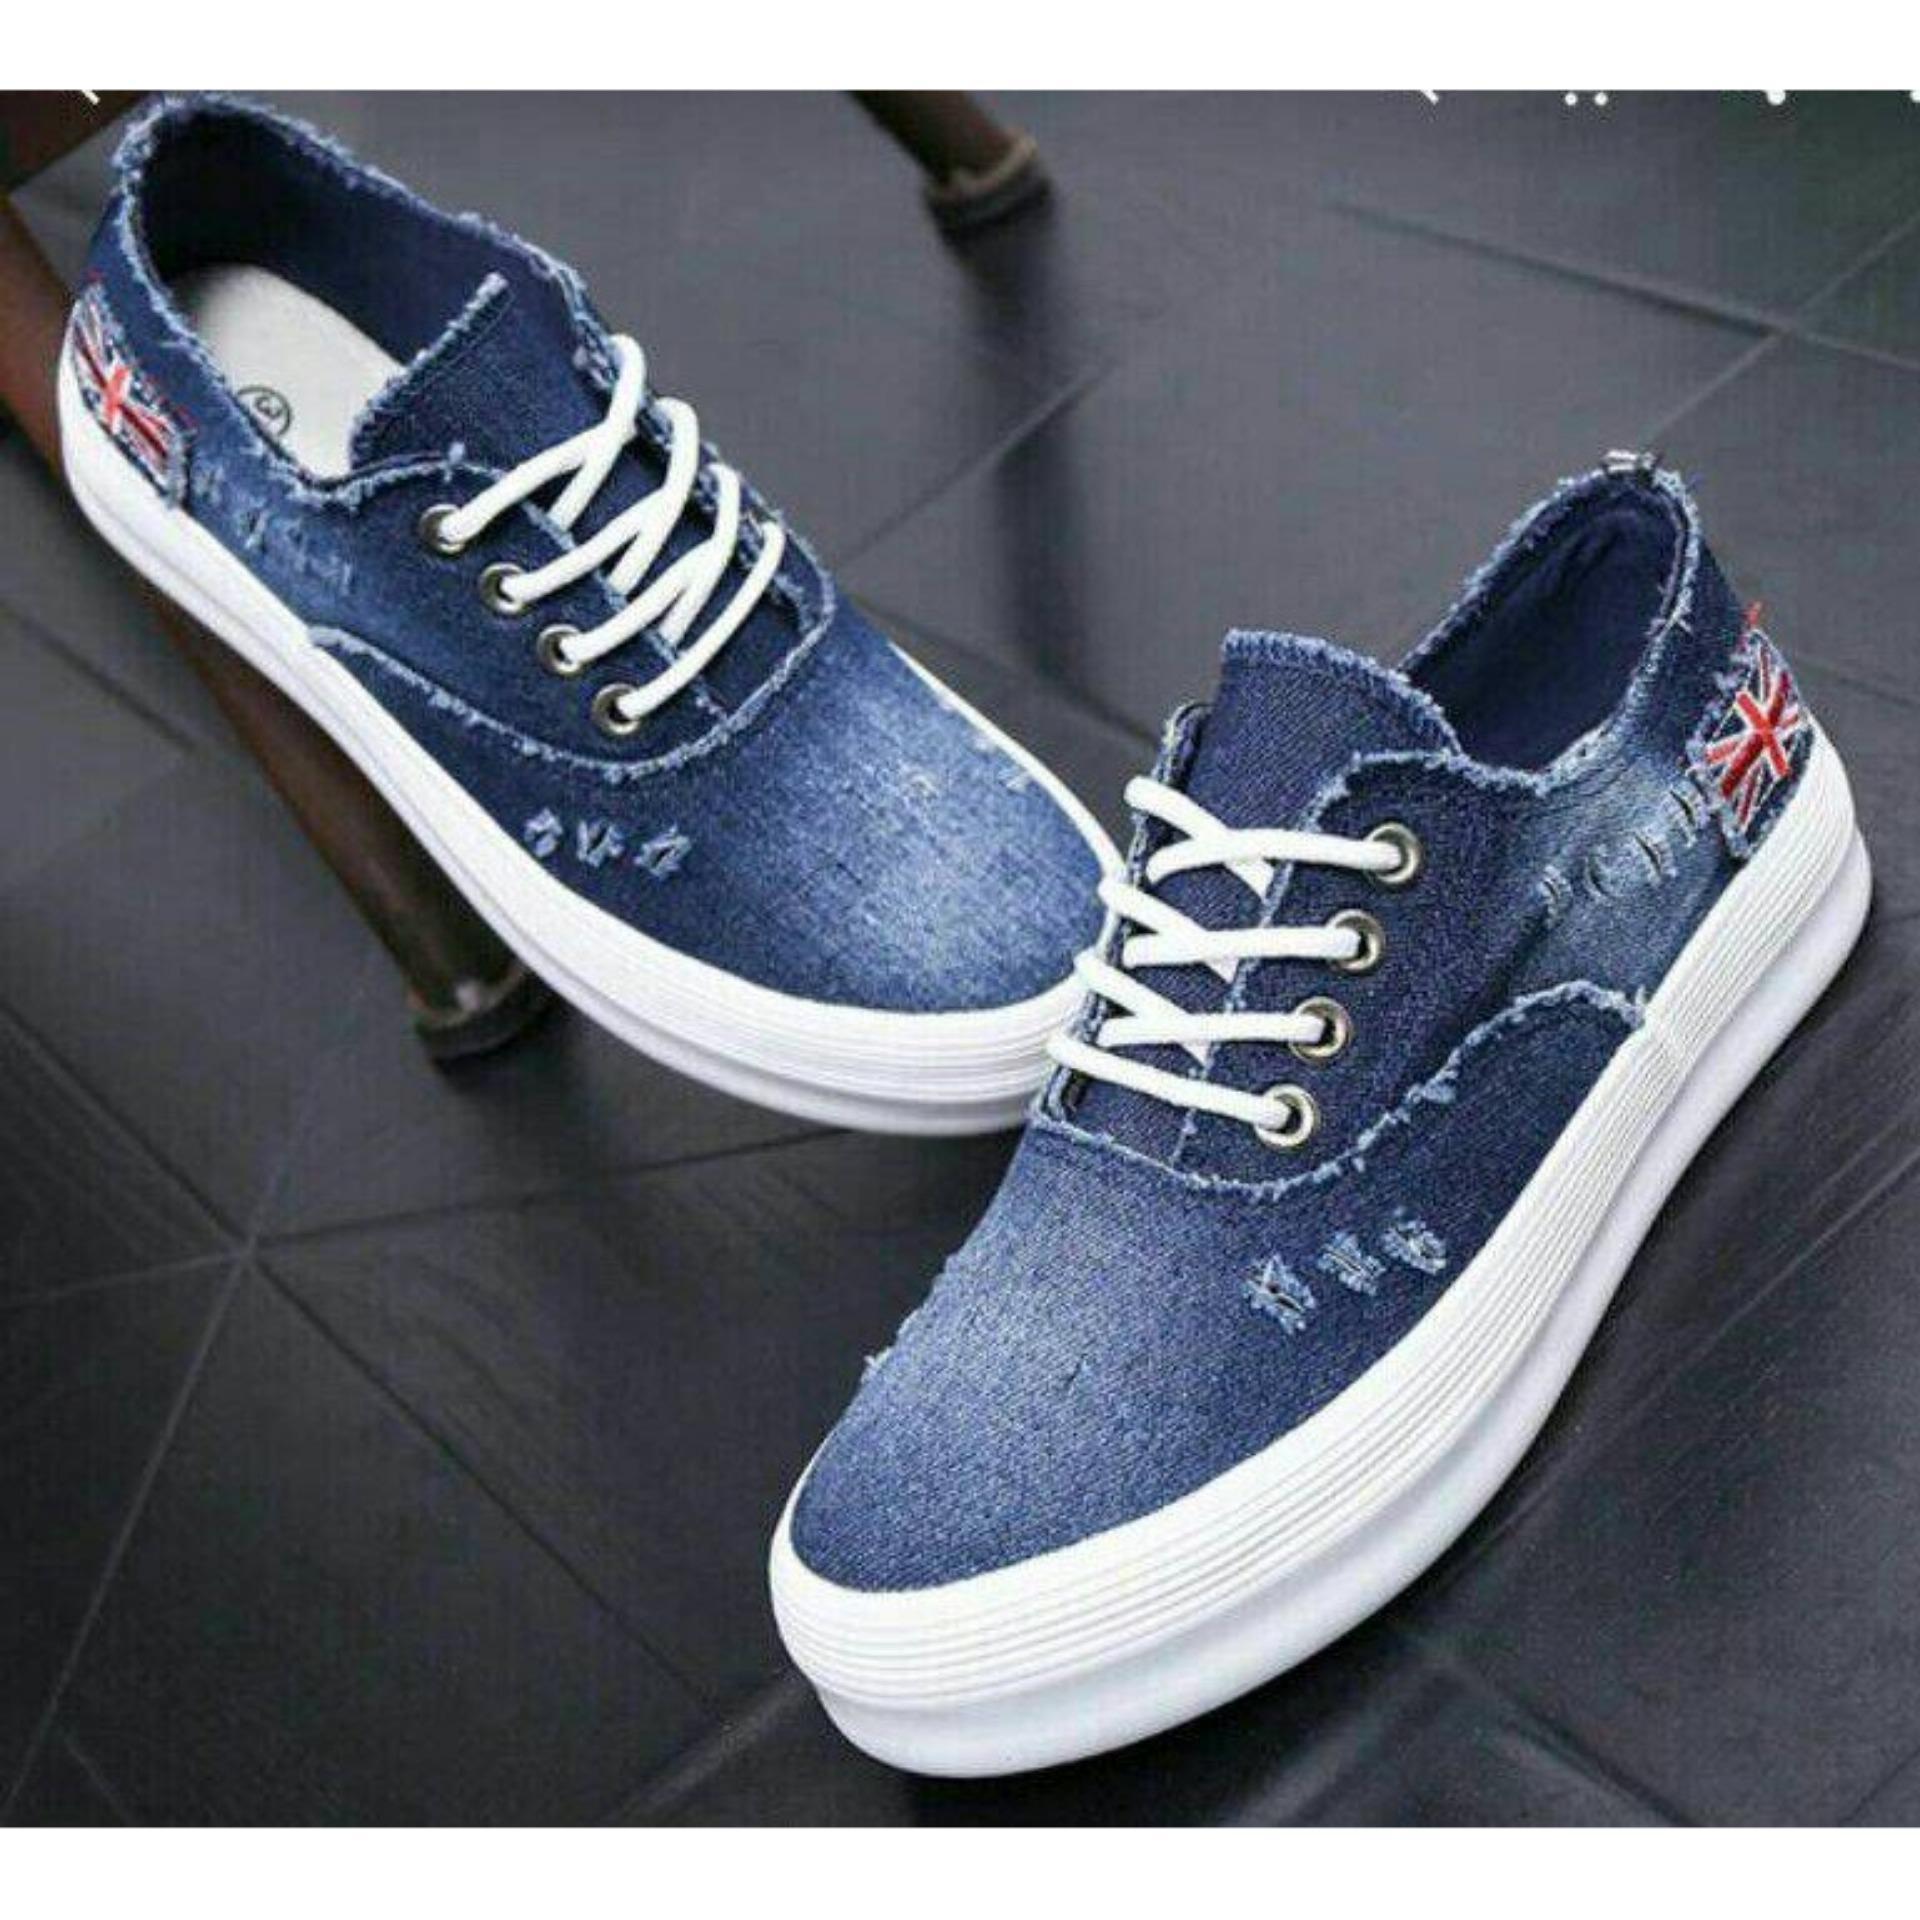 Nyaman di kaki Sepatu Kets Jeans Wanita Bendera England Denim - Biru Tua